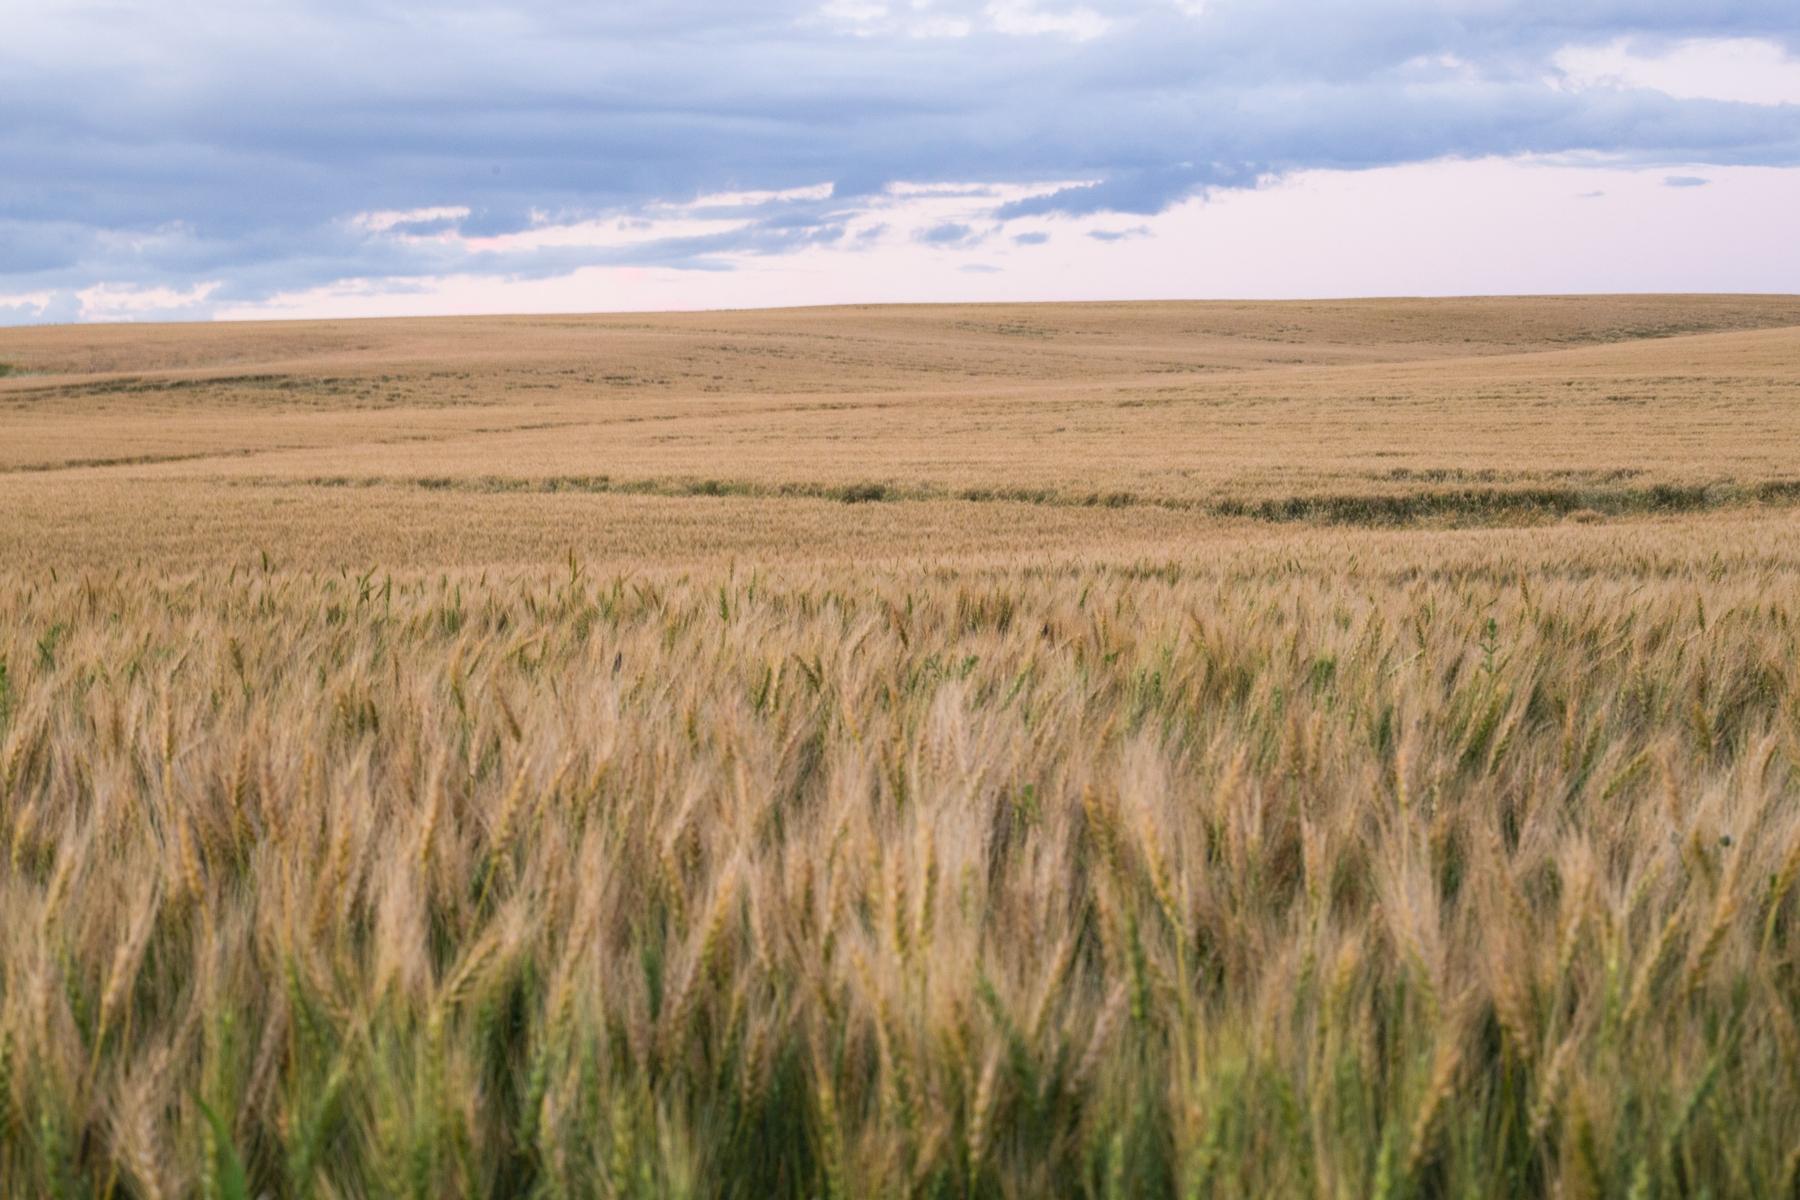 prairie land in Three Hills in Alberta. Blue cloudy sky in the background